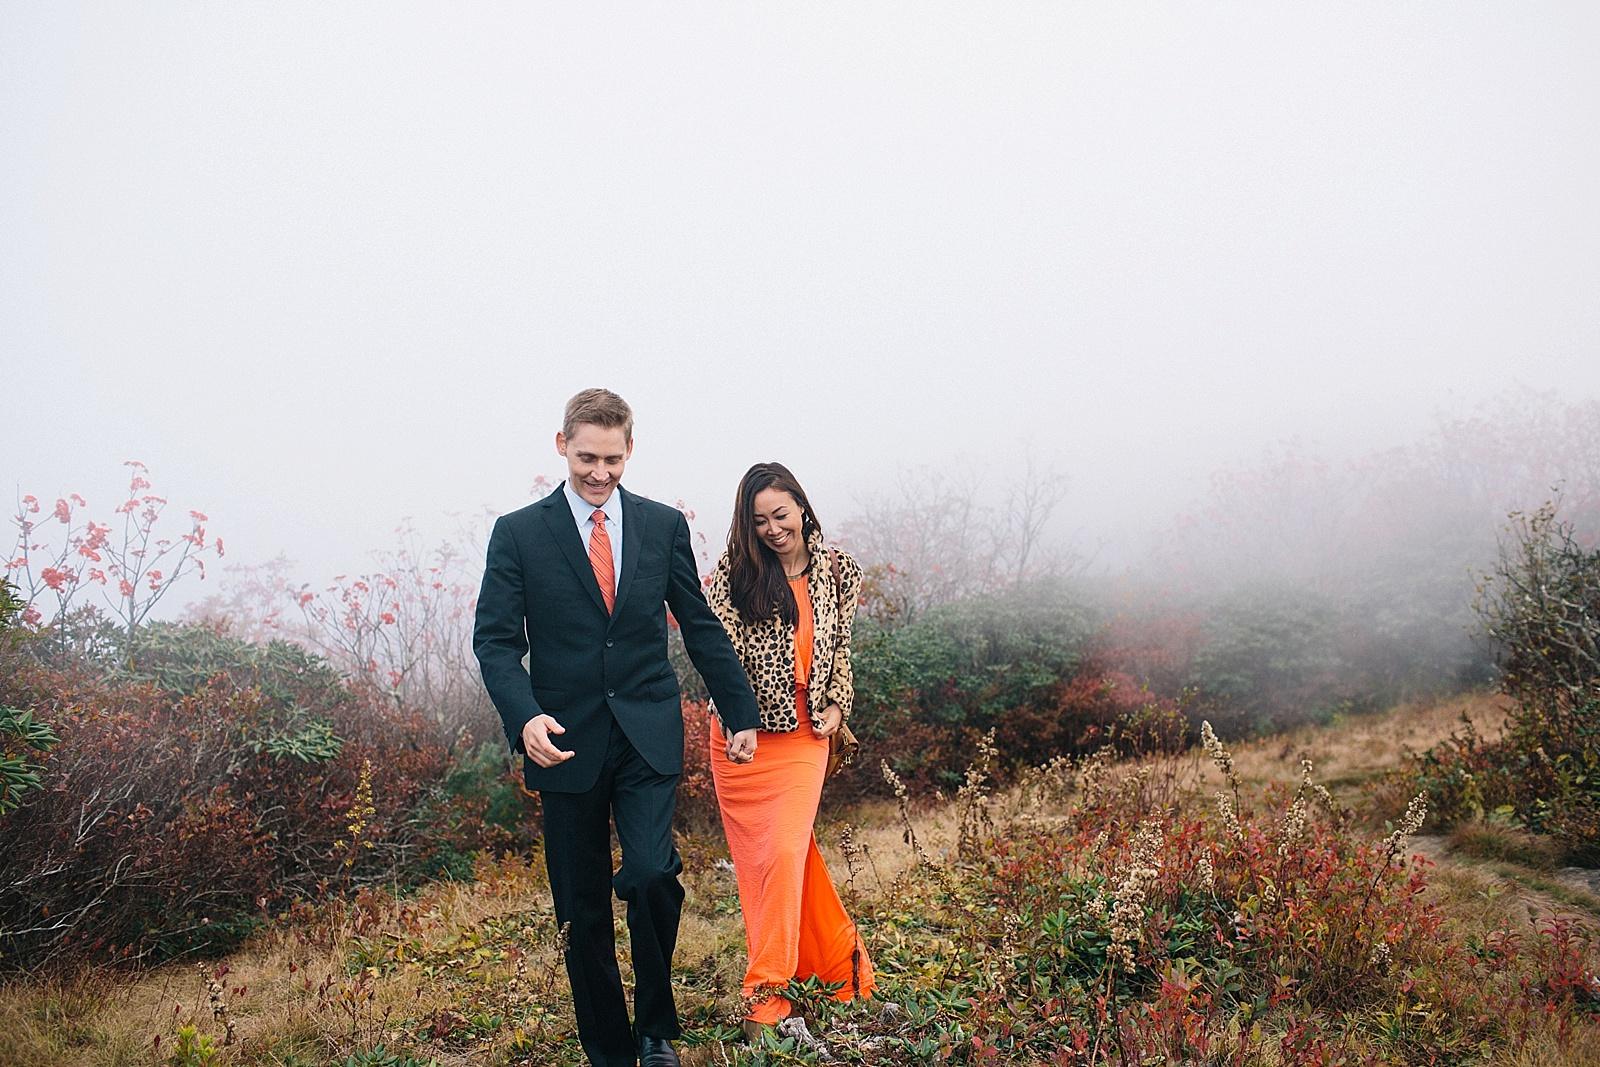 diana-elizabeth-blog-travel-fashion-blogger-north-carolina-wedding-elopement-craggy-pinnacle-trail_0011